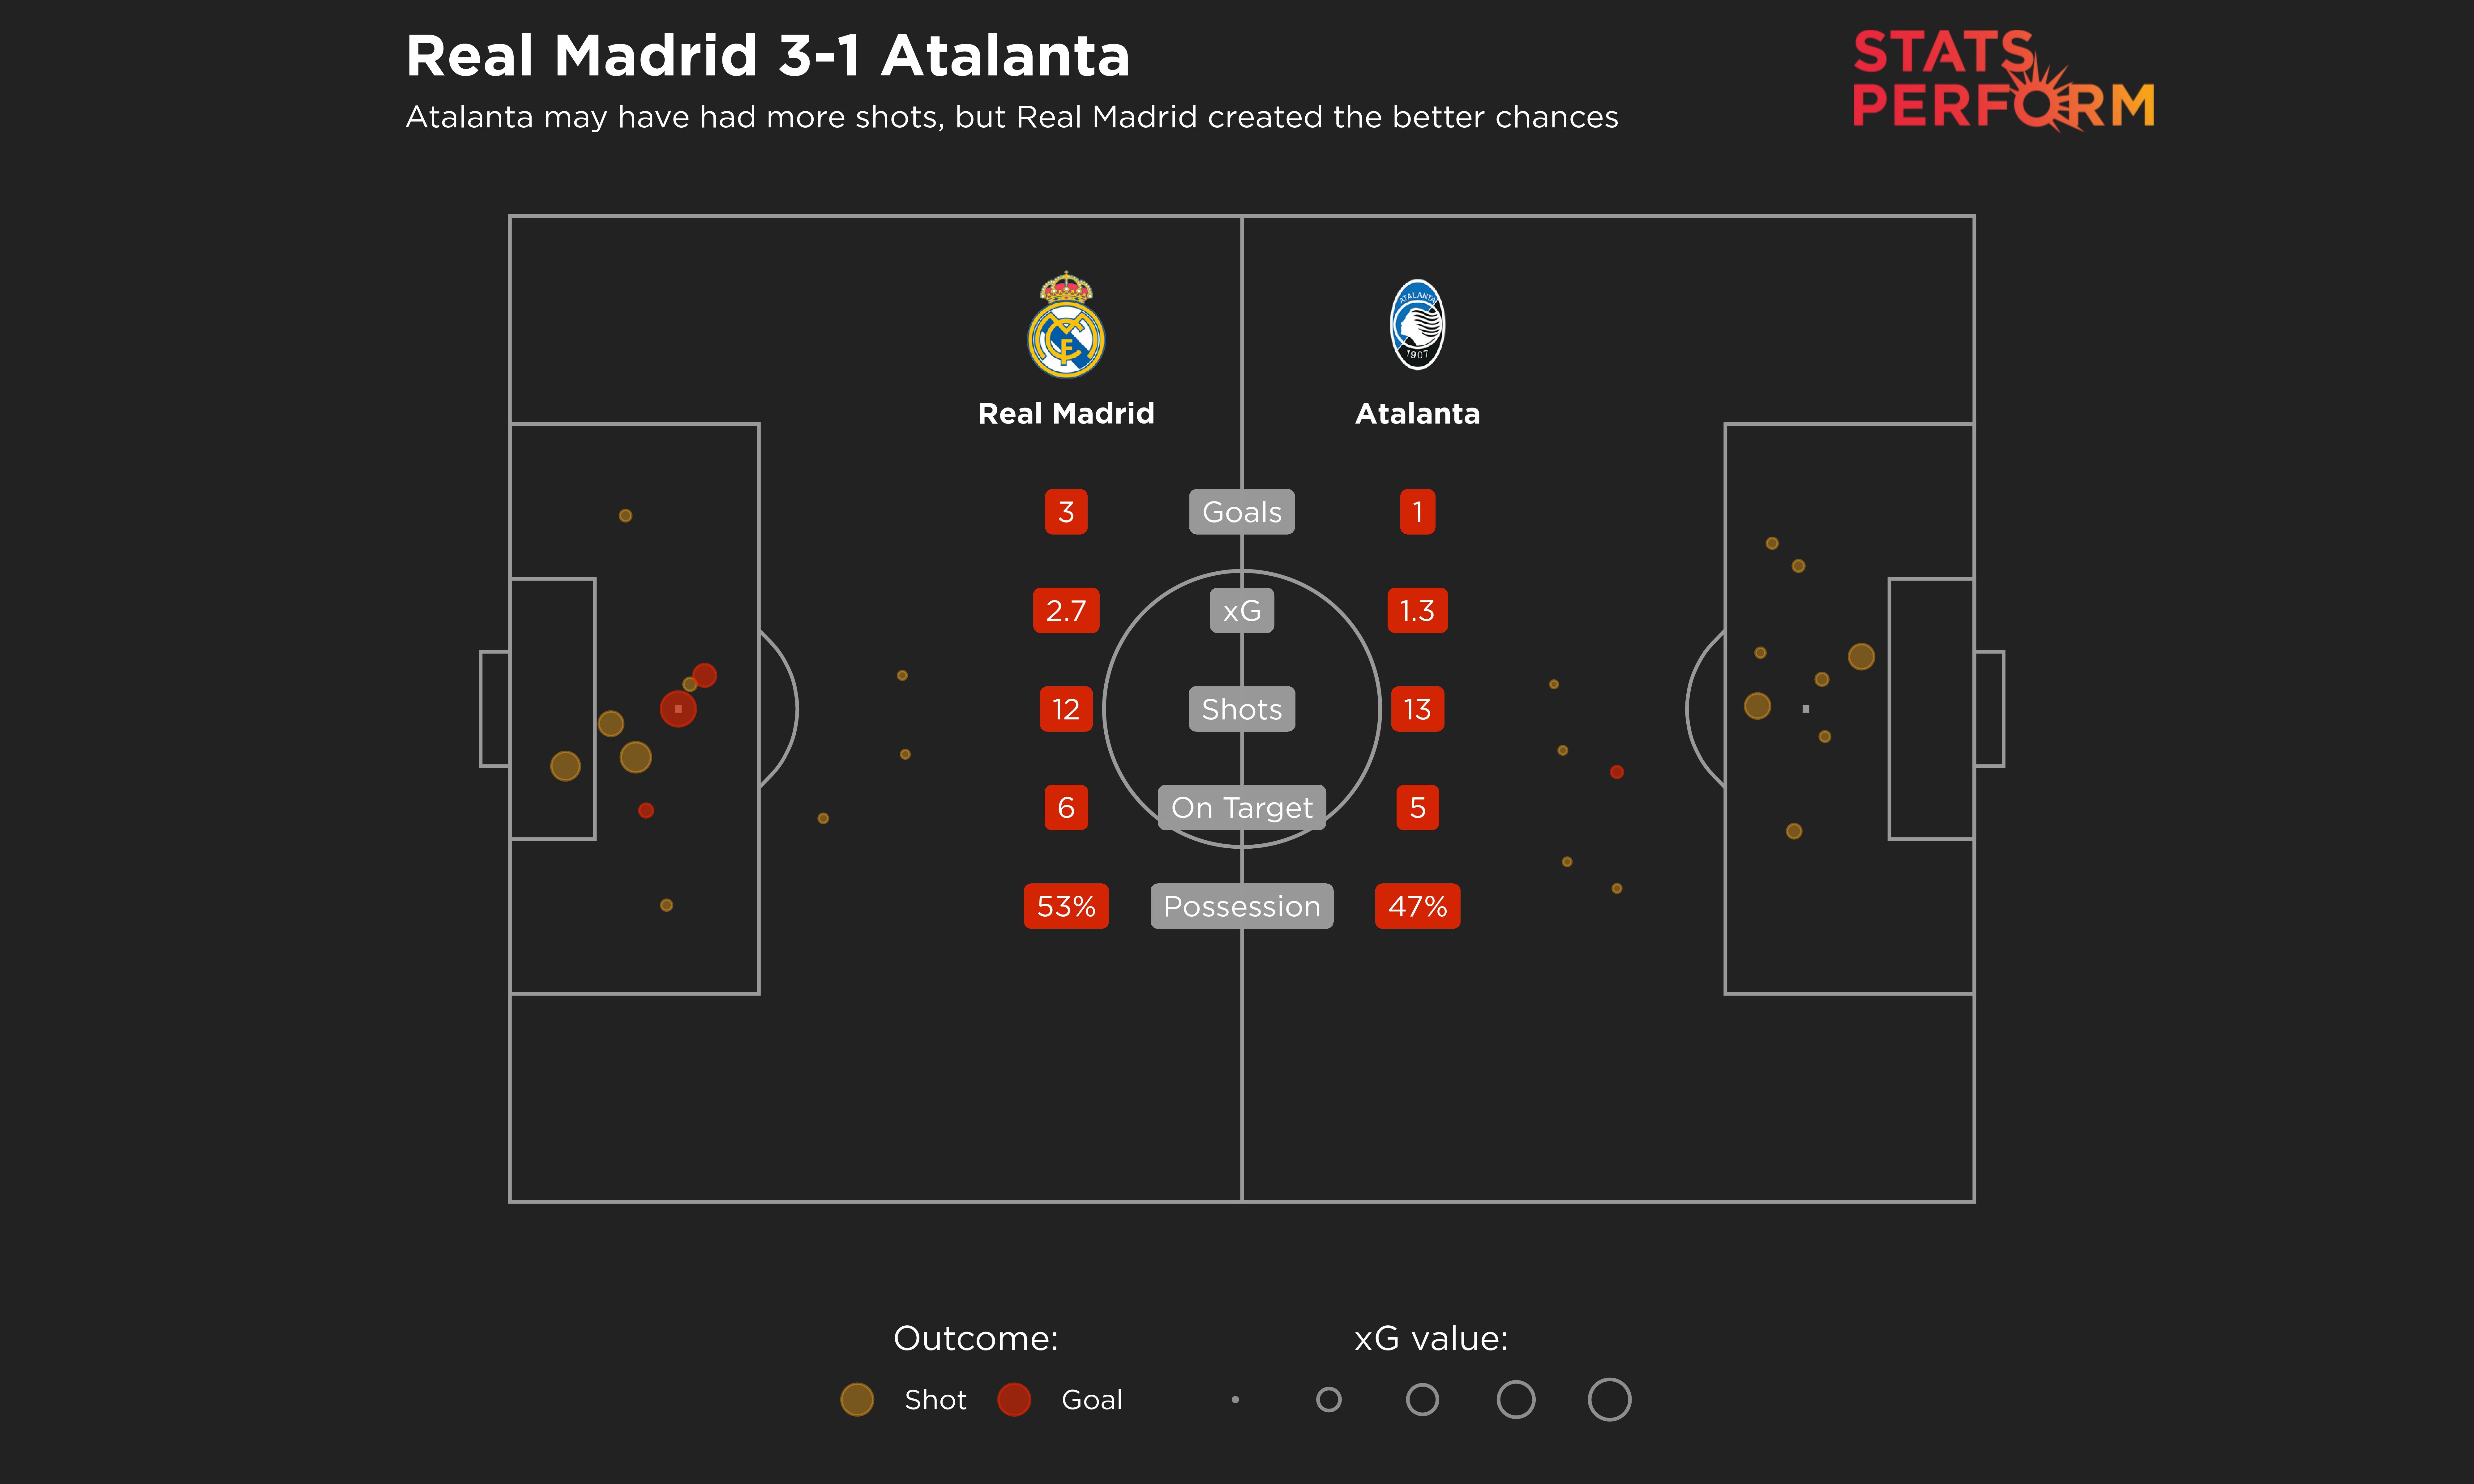 Atalanta had more shots, but Real Madrid created the better chances